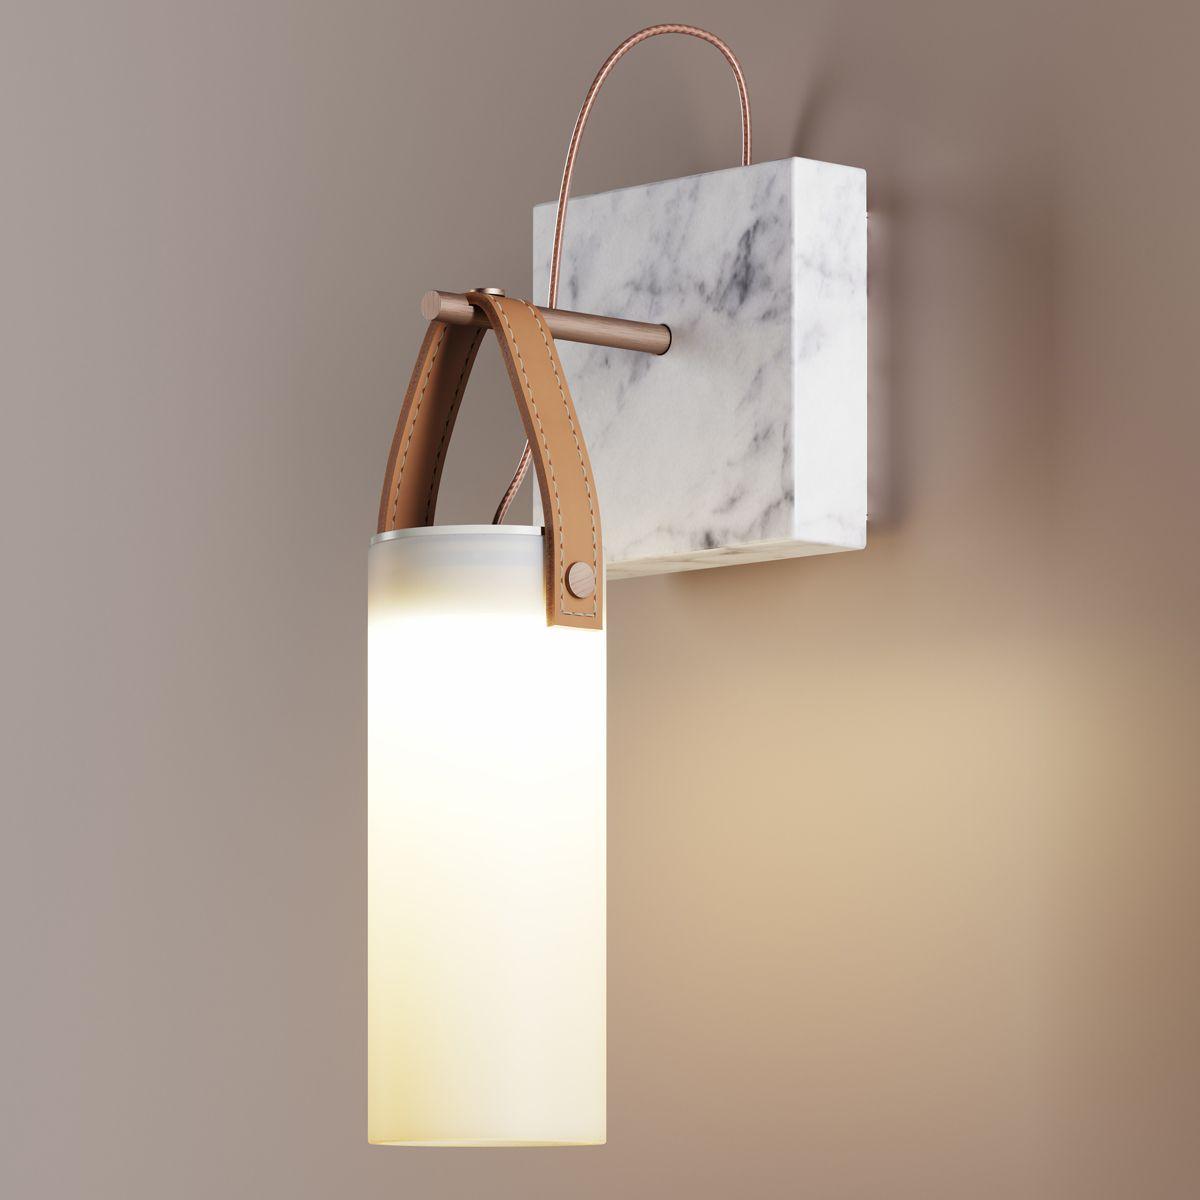 fontana arte lampada design illuminazione pavia